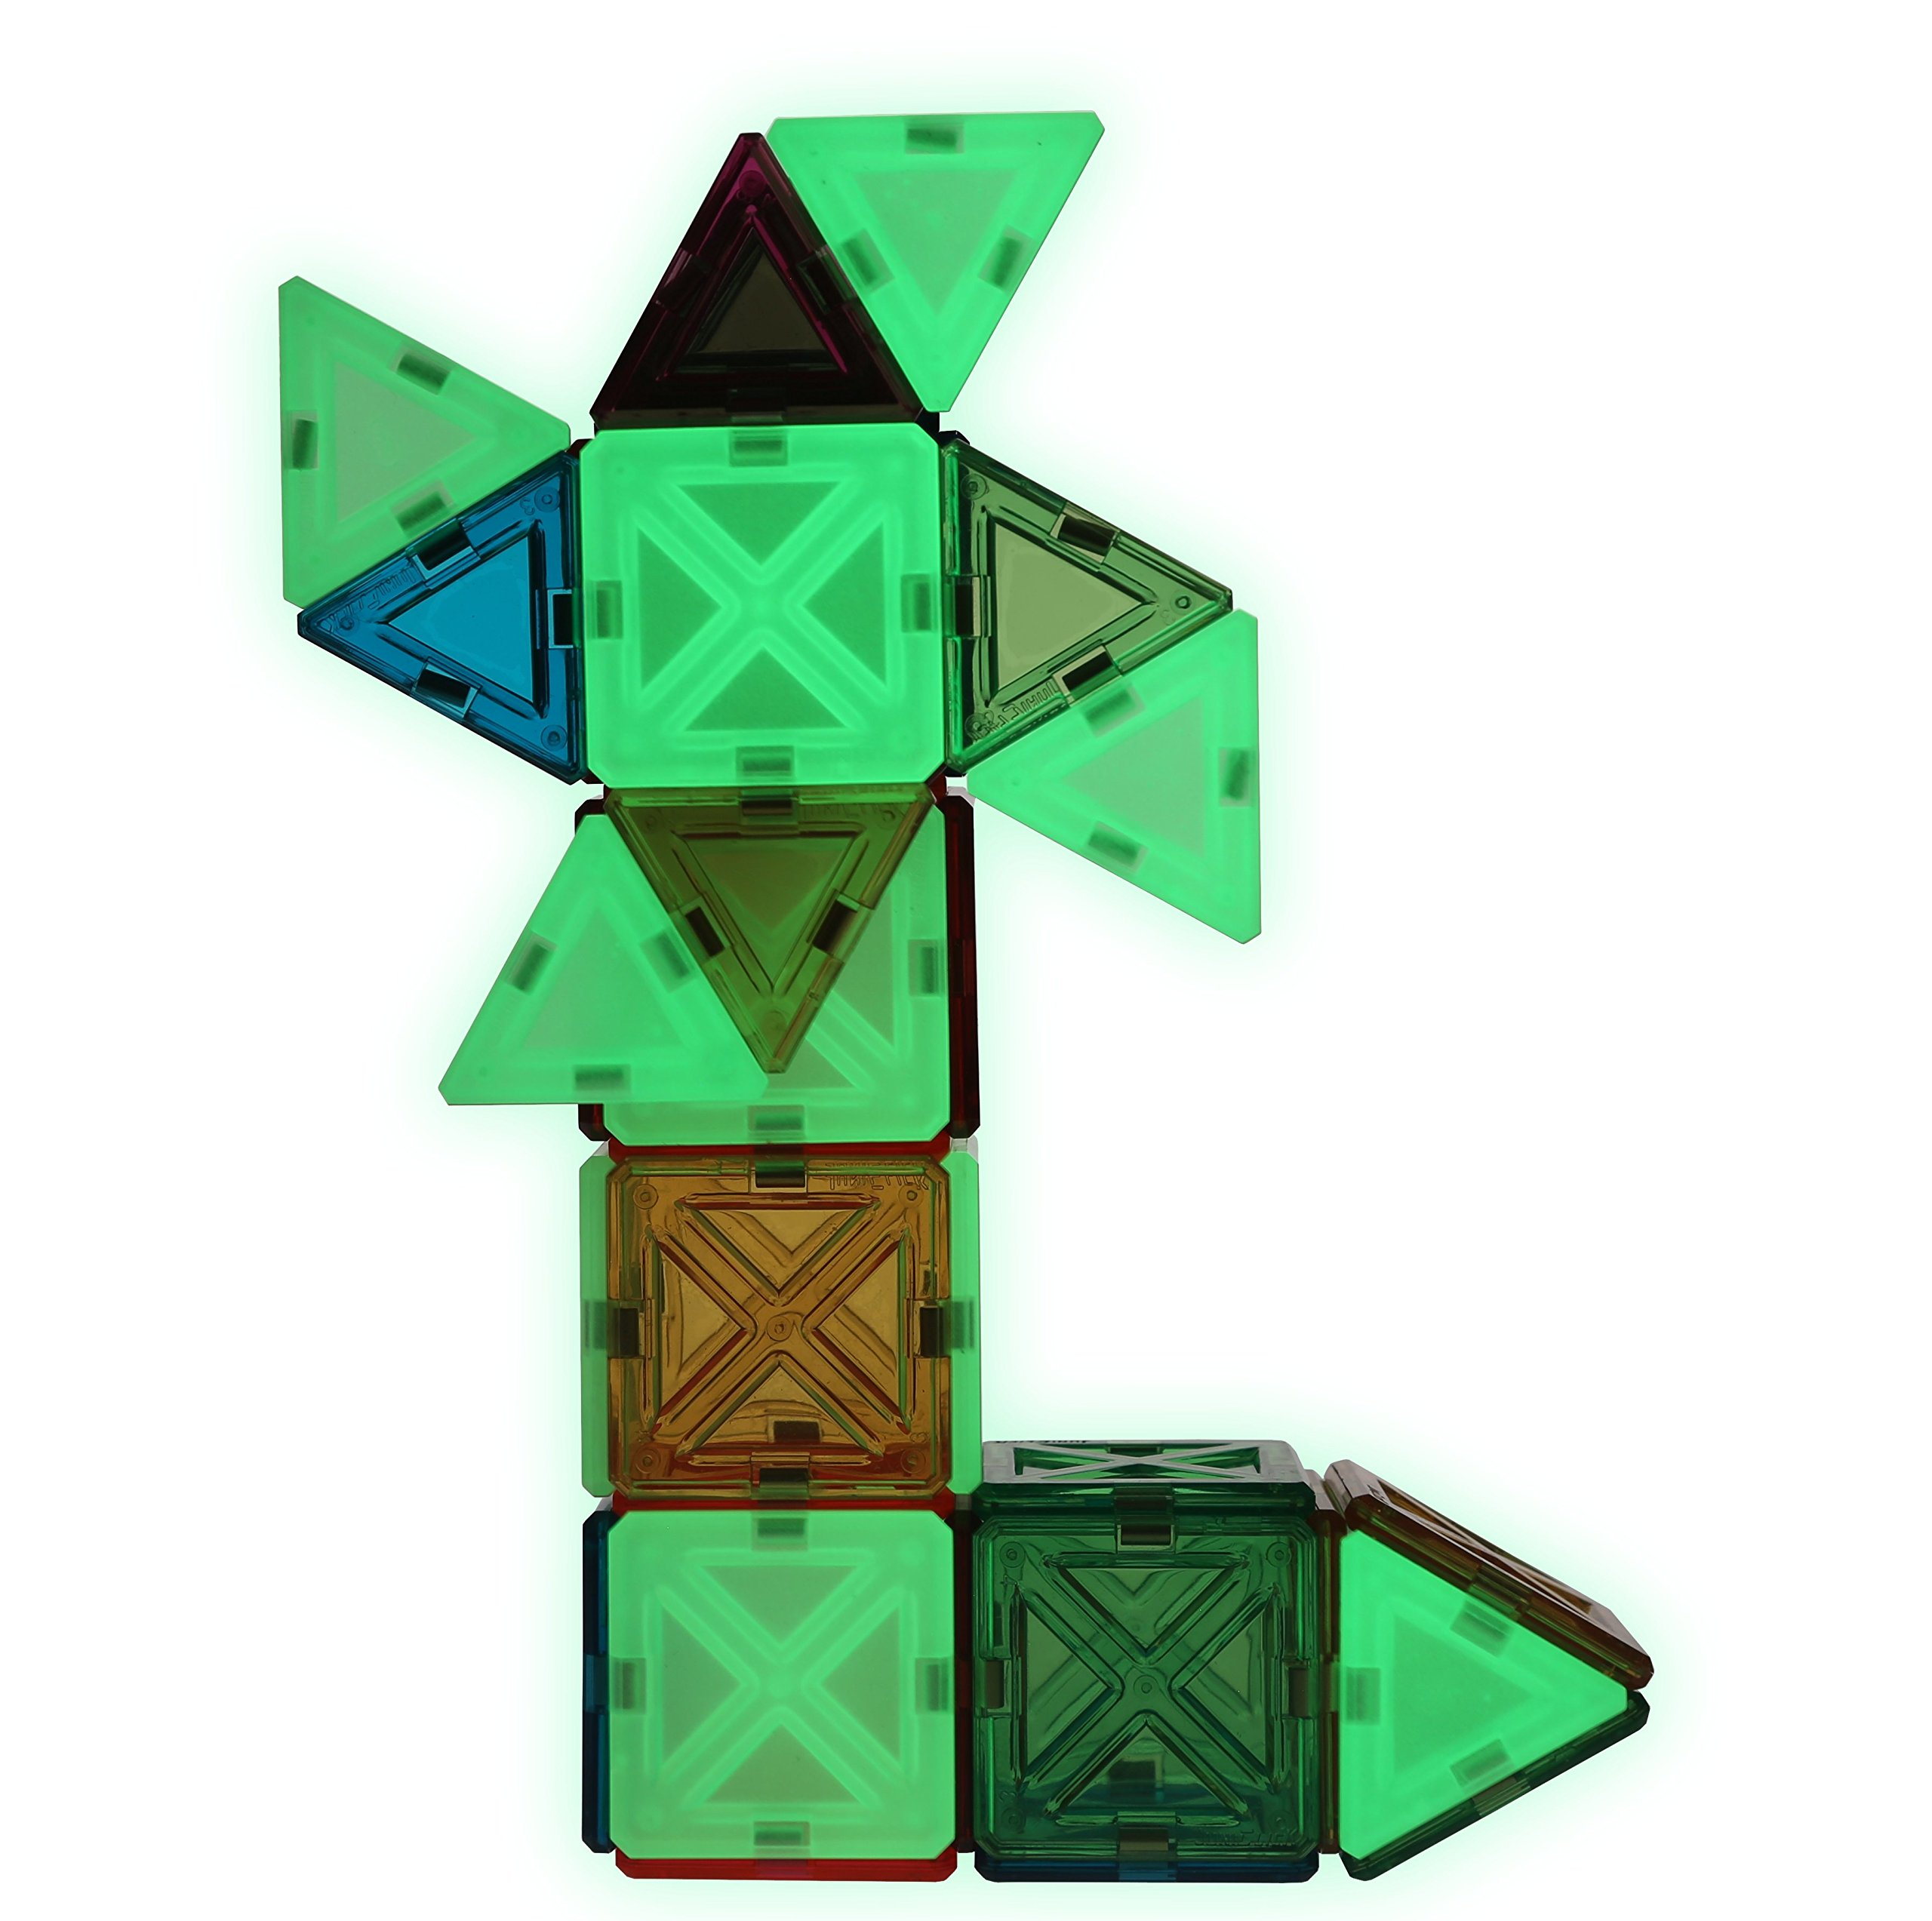 JuniClick Translucent Magnetic Building Mini Tiles, 54 Piece Starlight Set